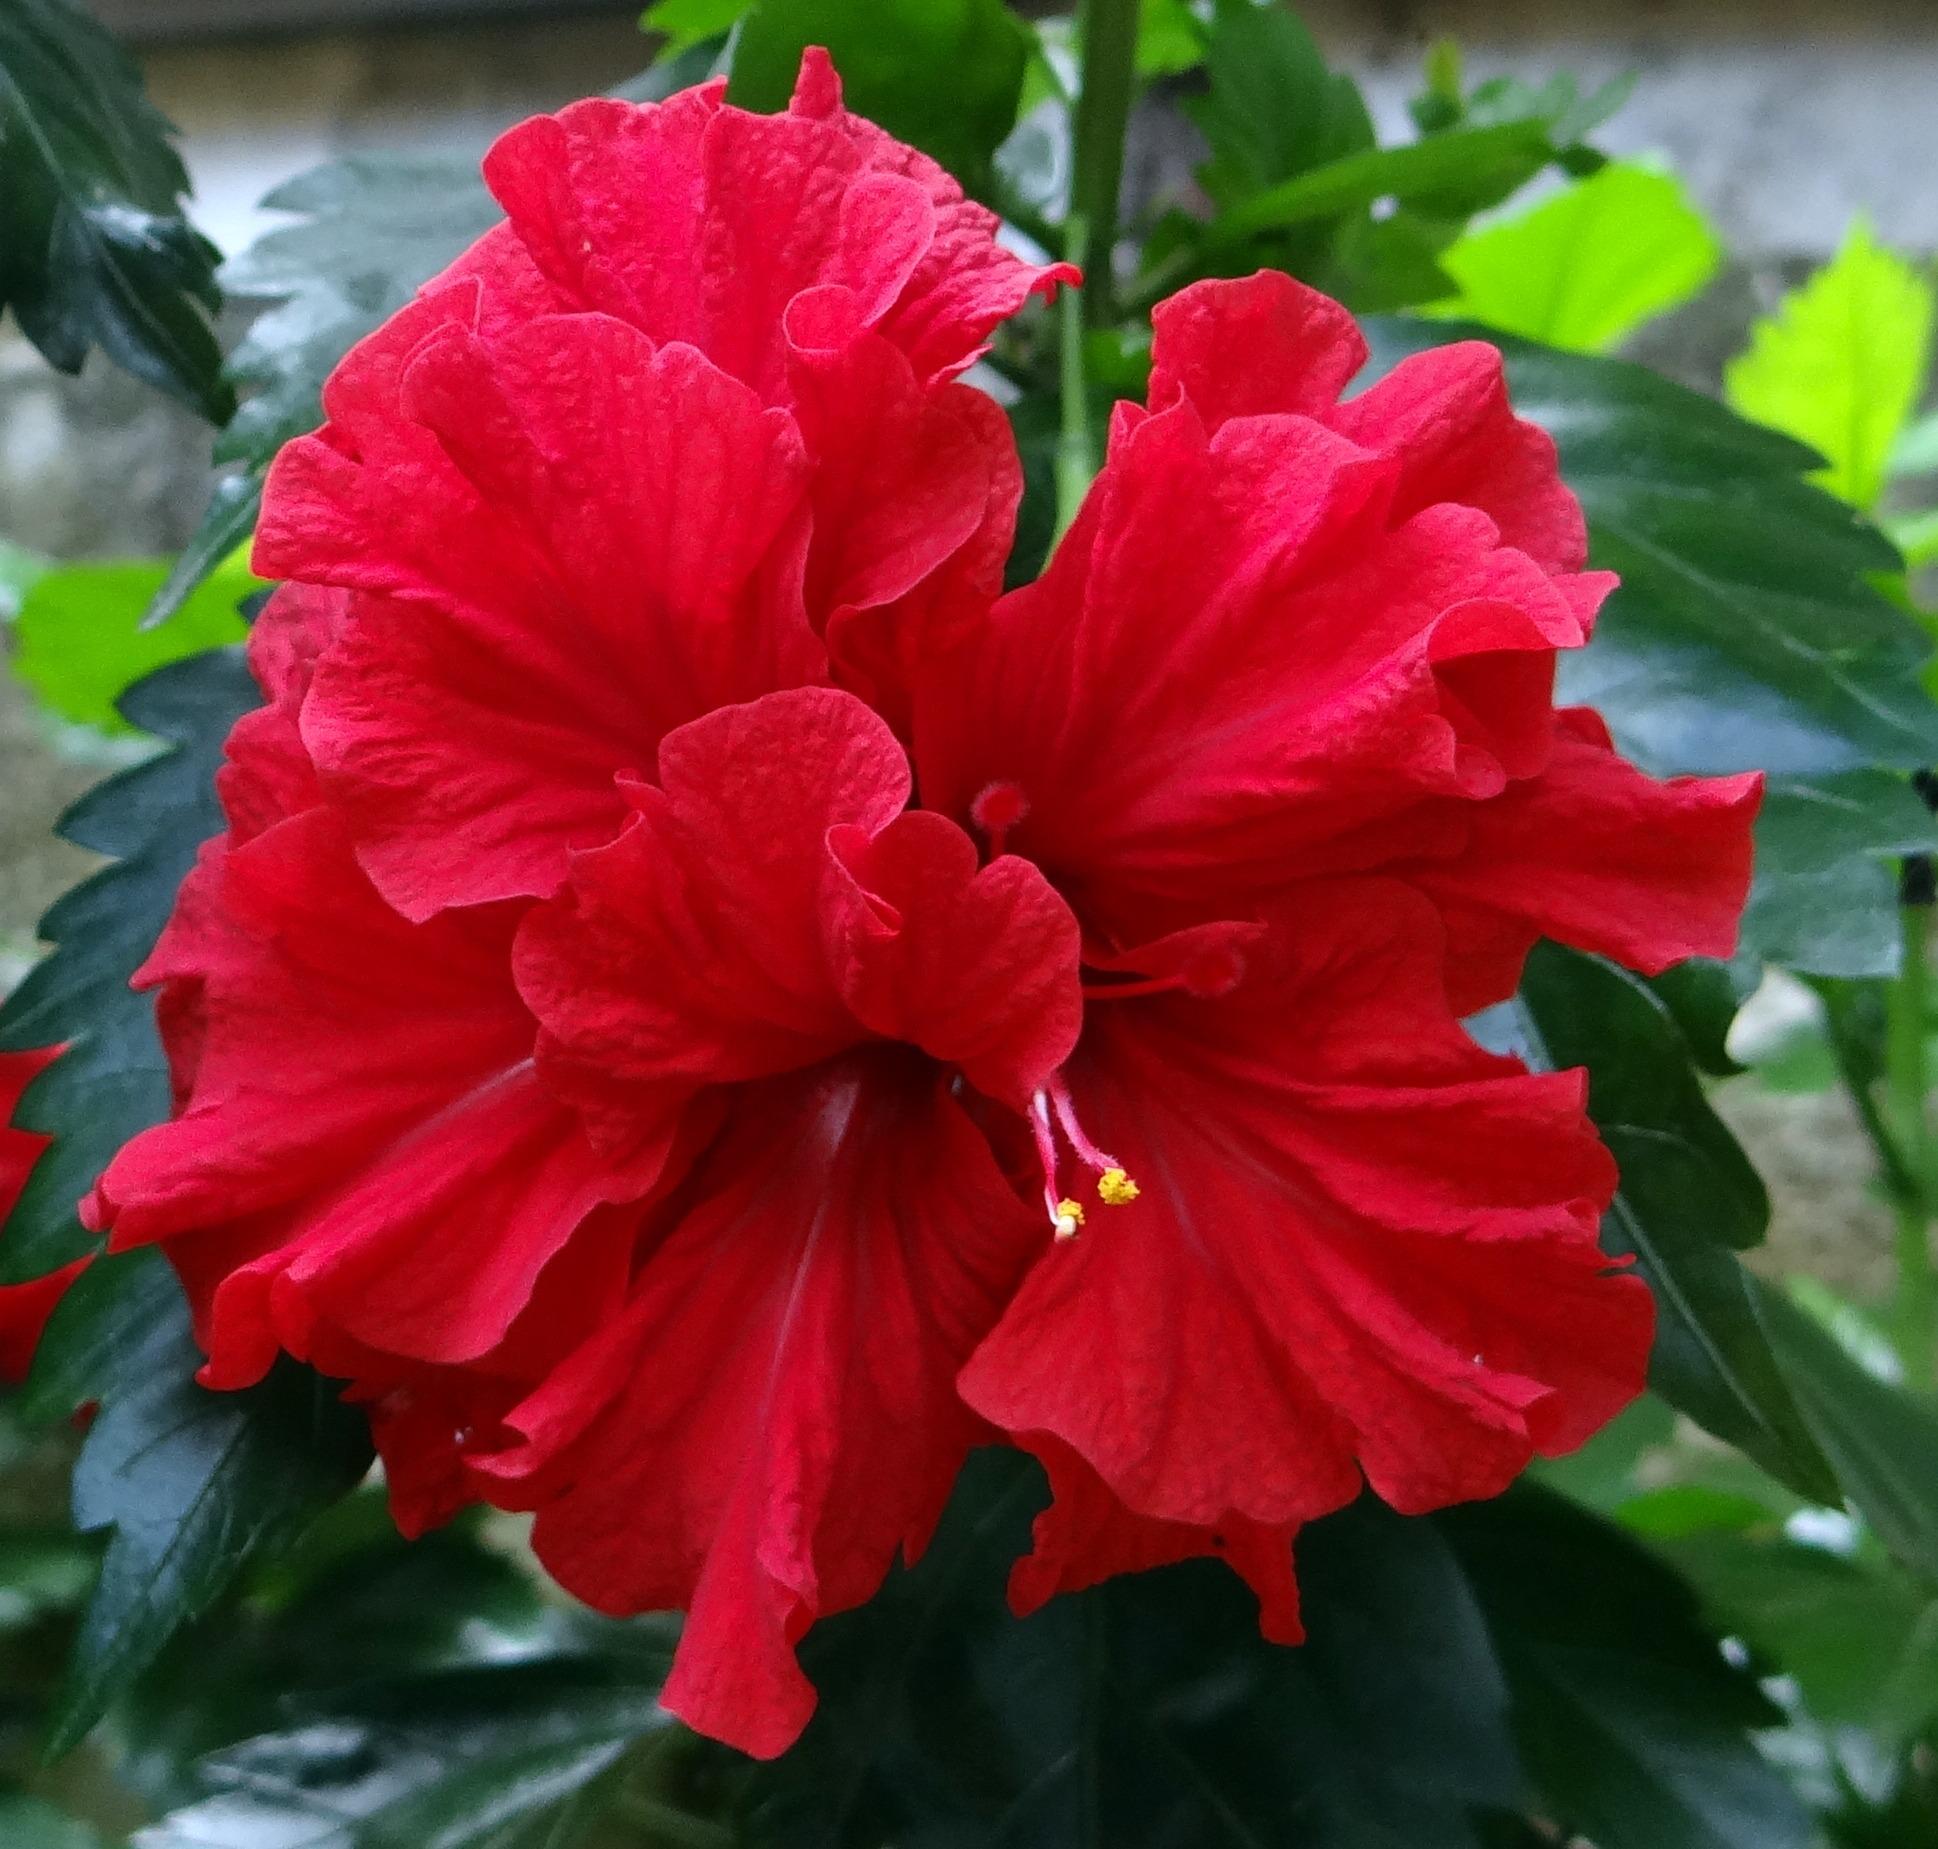 Free Images Flower Petal Red Dharwad Flora Shrub India